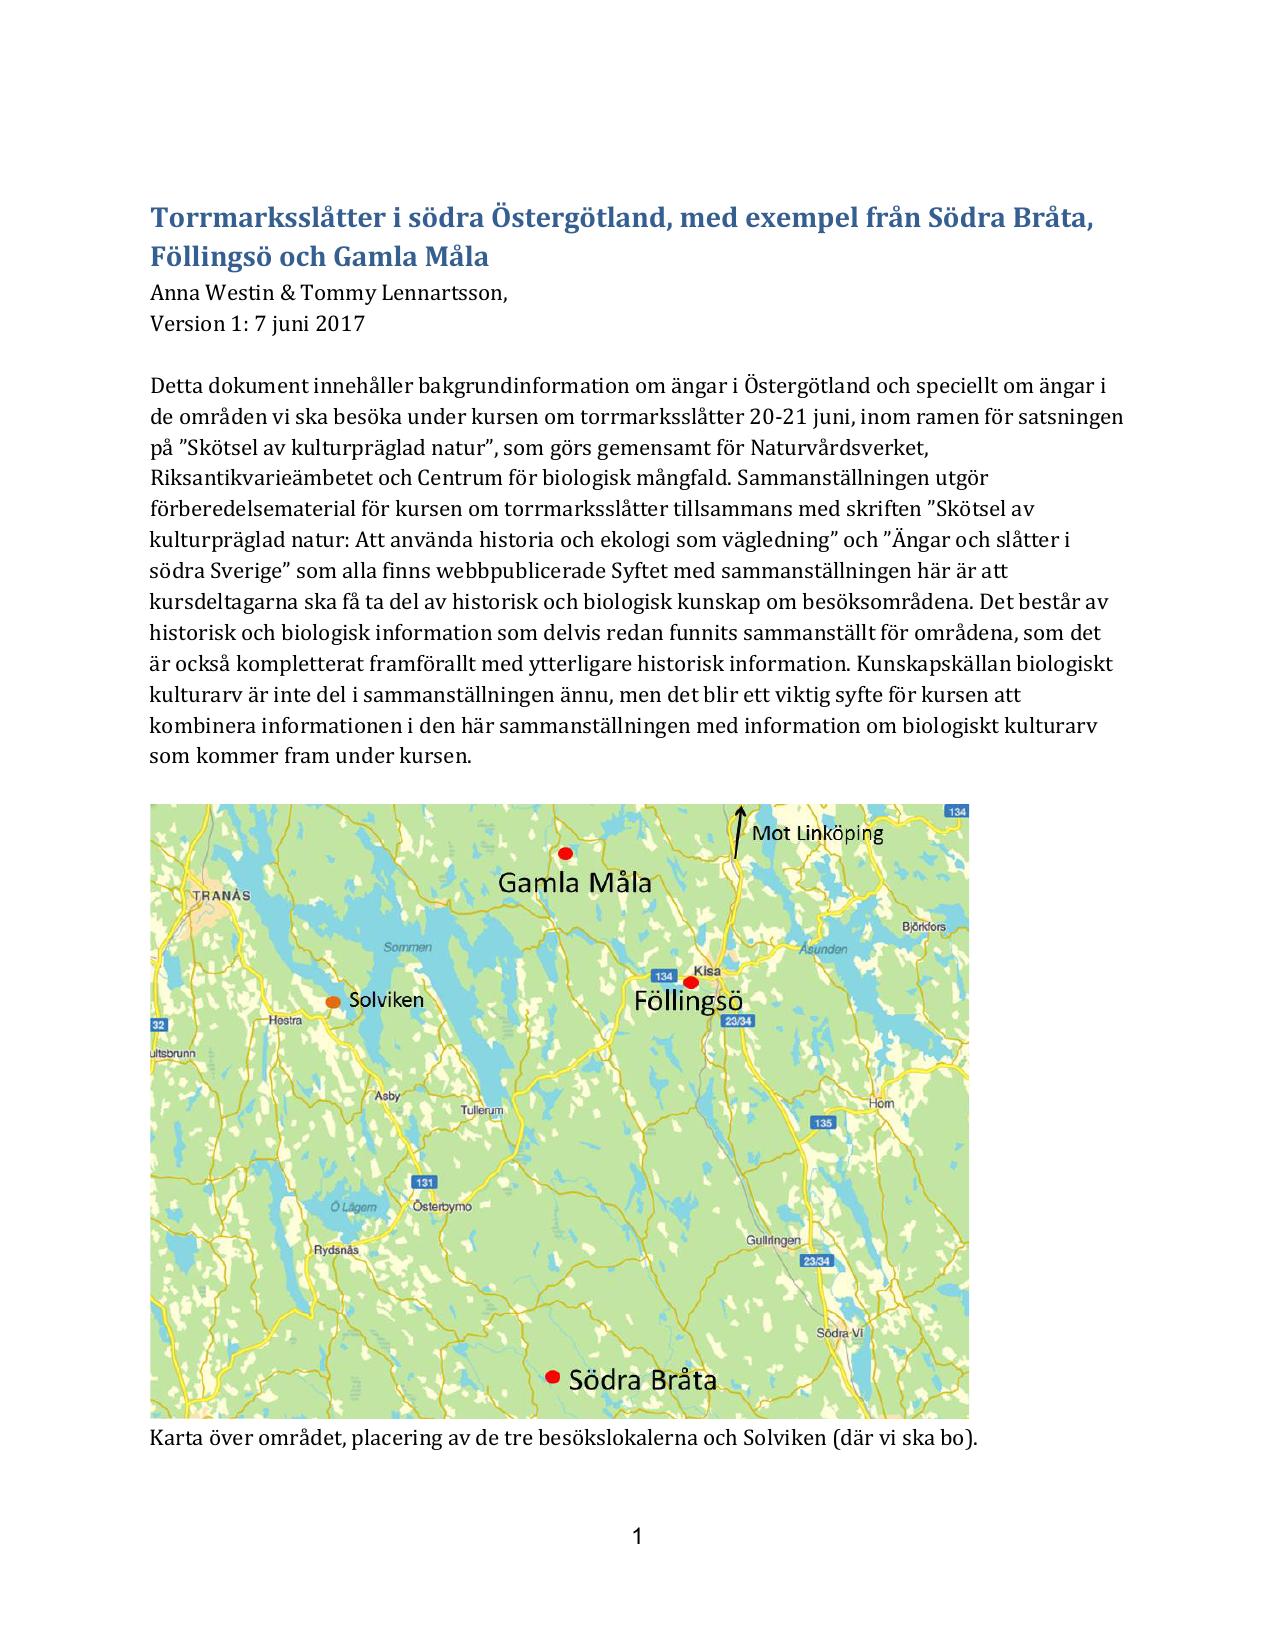 Torrmarksslatter I Sodra Ostergotland Med Exempel Fran